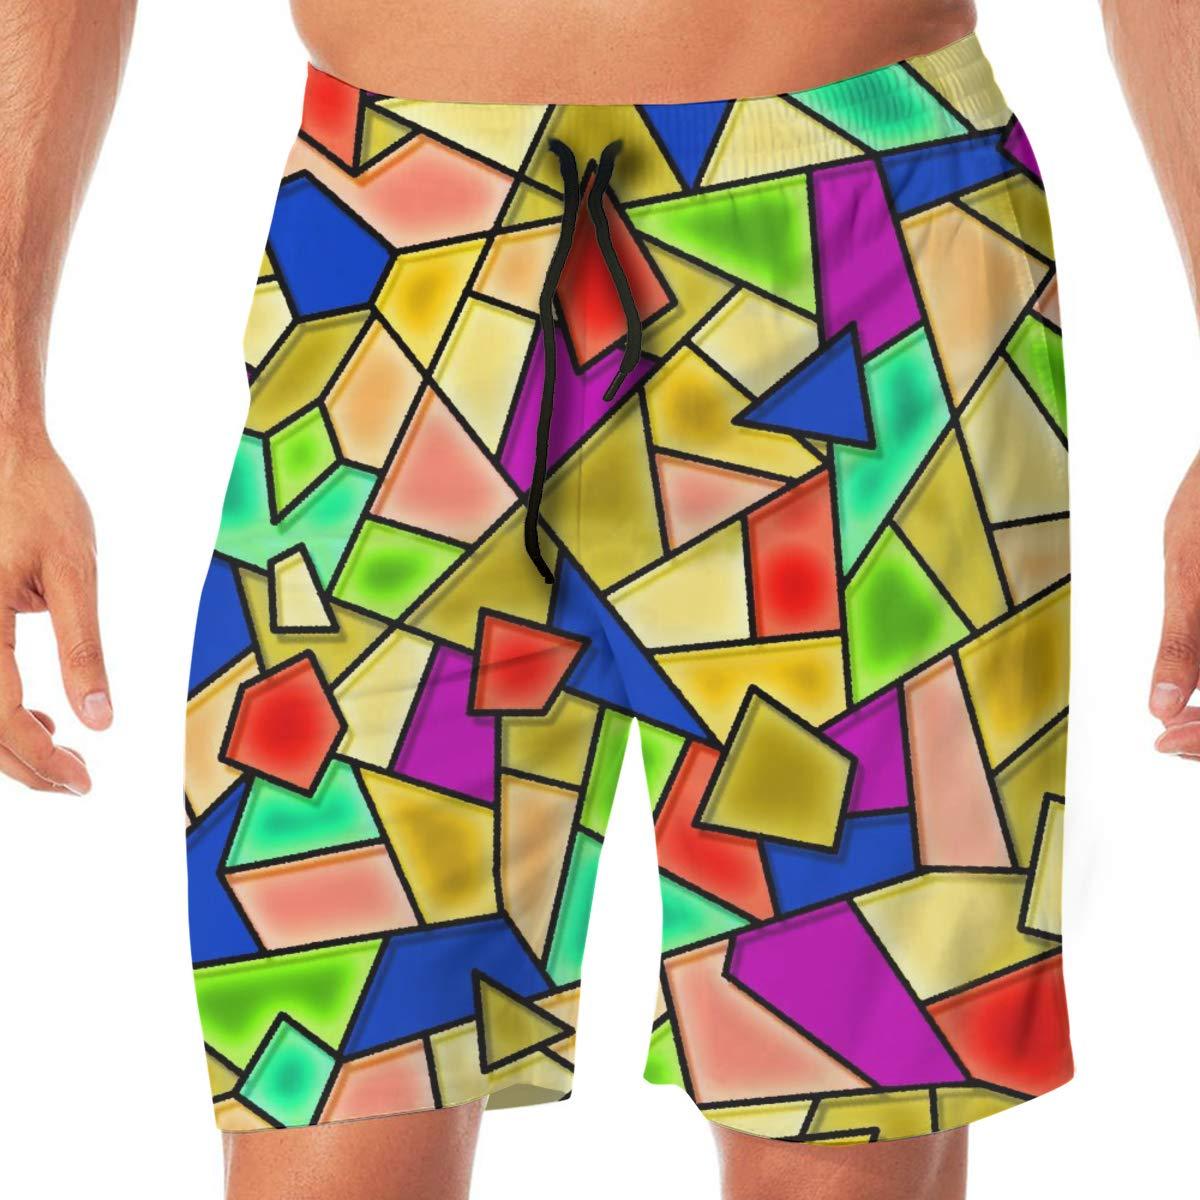 L Cbyan Beach Trunks Mens Swim Trunks Swimming Short with Pockets M XL XXL